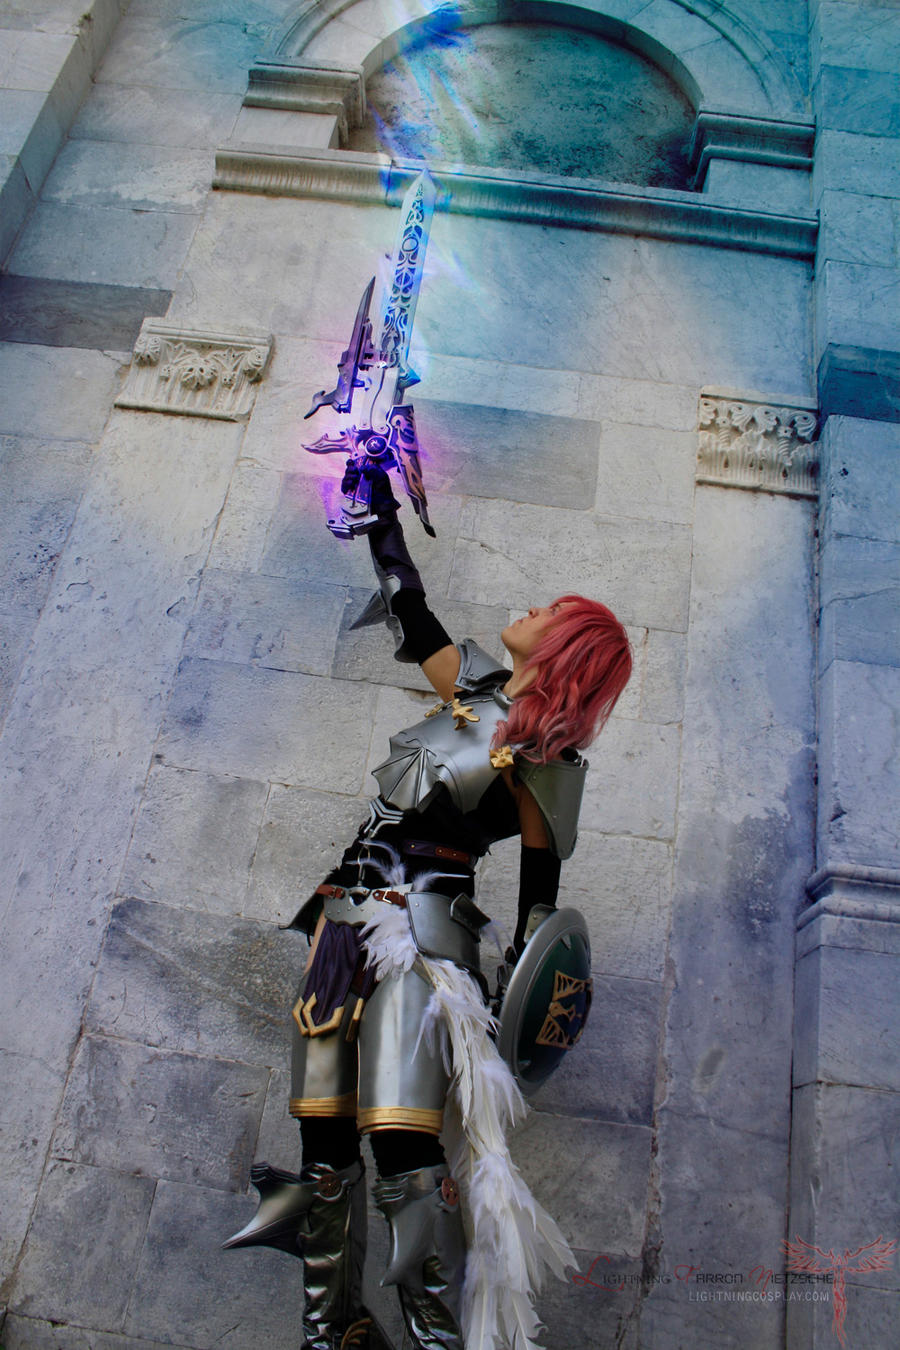 Lightning Strike by LightningTheArtist